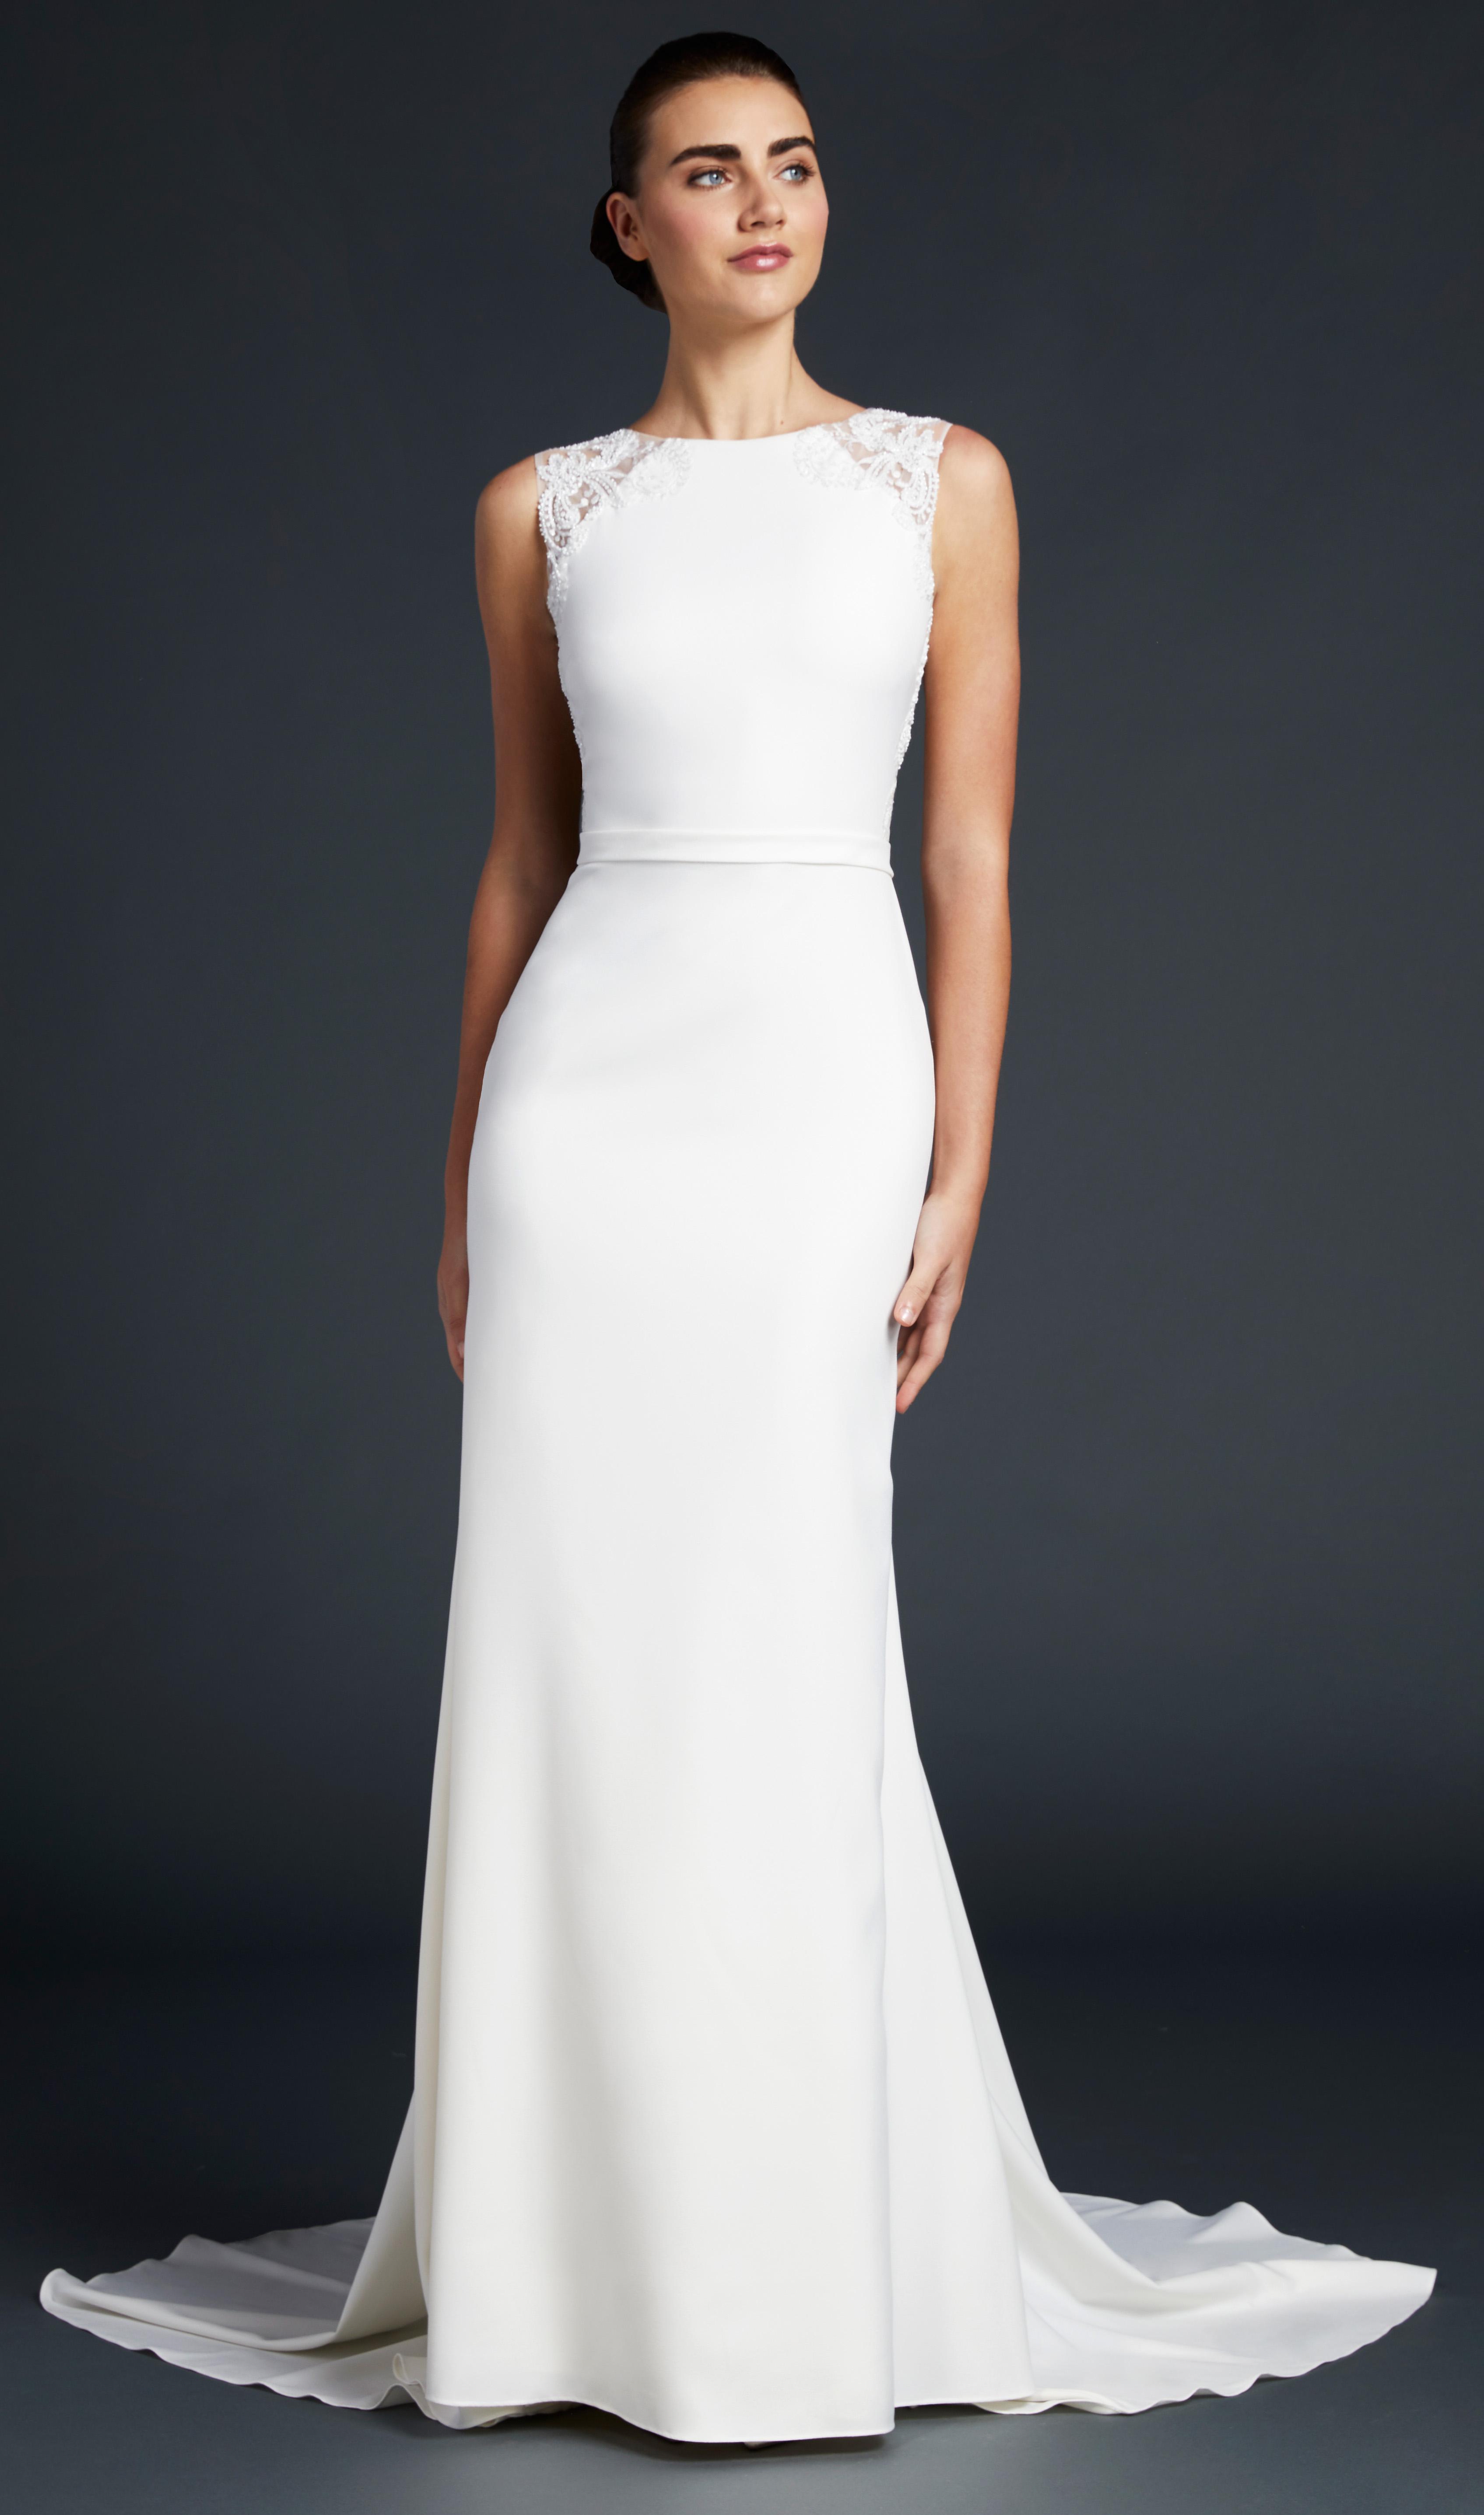 blue willow wedding dress sleeveless high neck lace shoulder detail